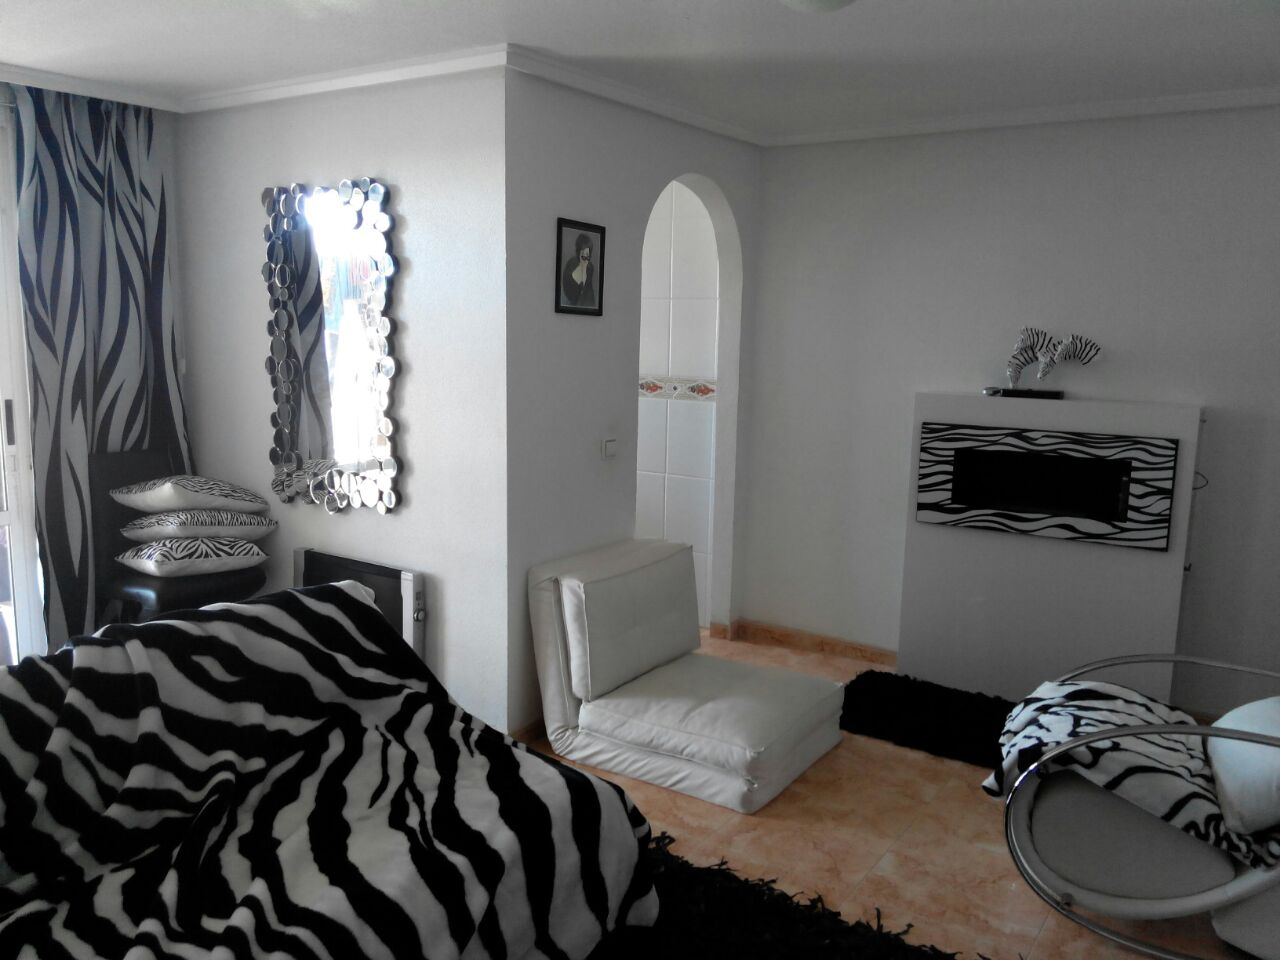 GT-0035-TN : Апартаменты в Торревьеха